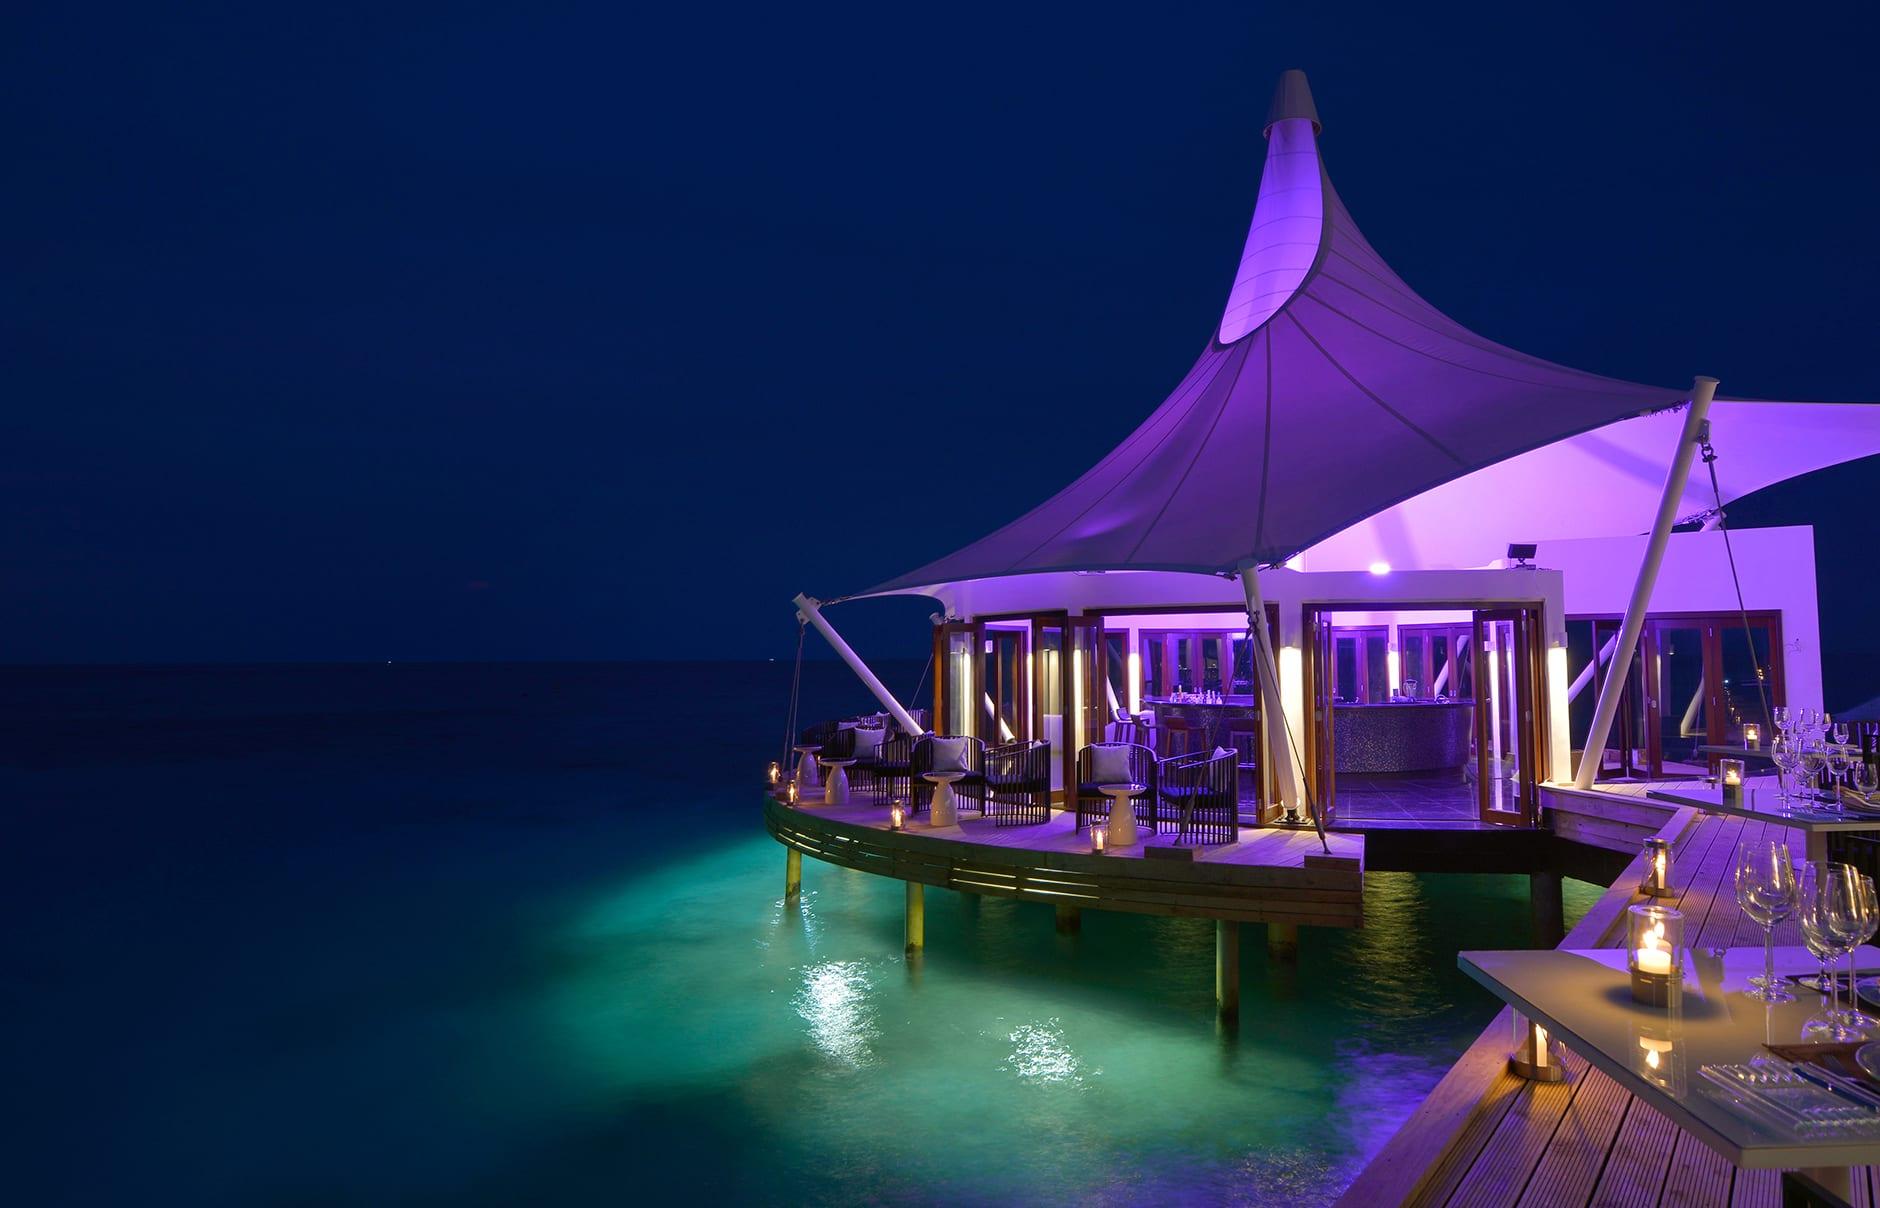 Edge Lounge. Niyama Private Islands Maldives. Hotel Review by TravelPlusStyle. Photo © NIYAMA